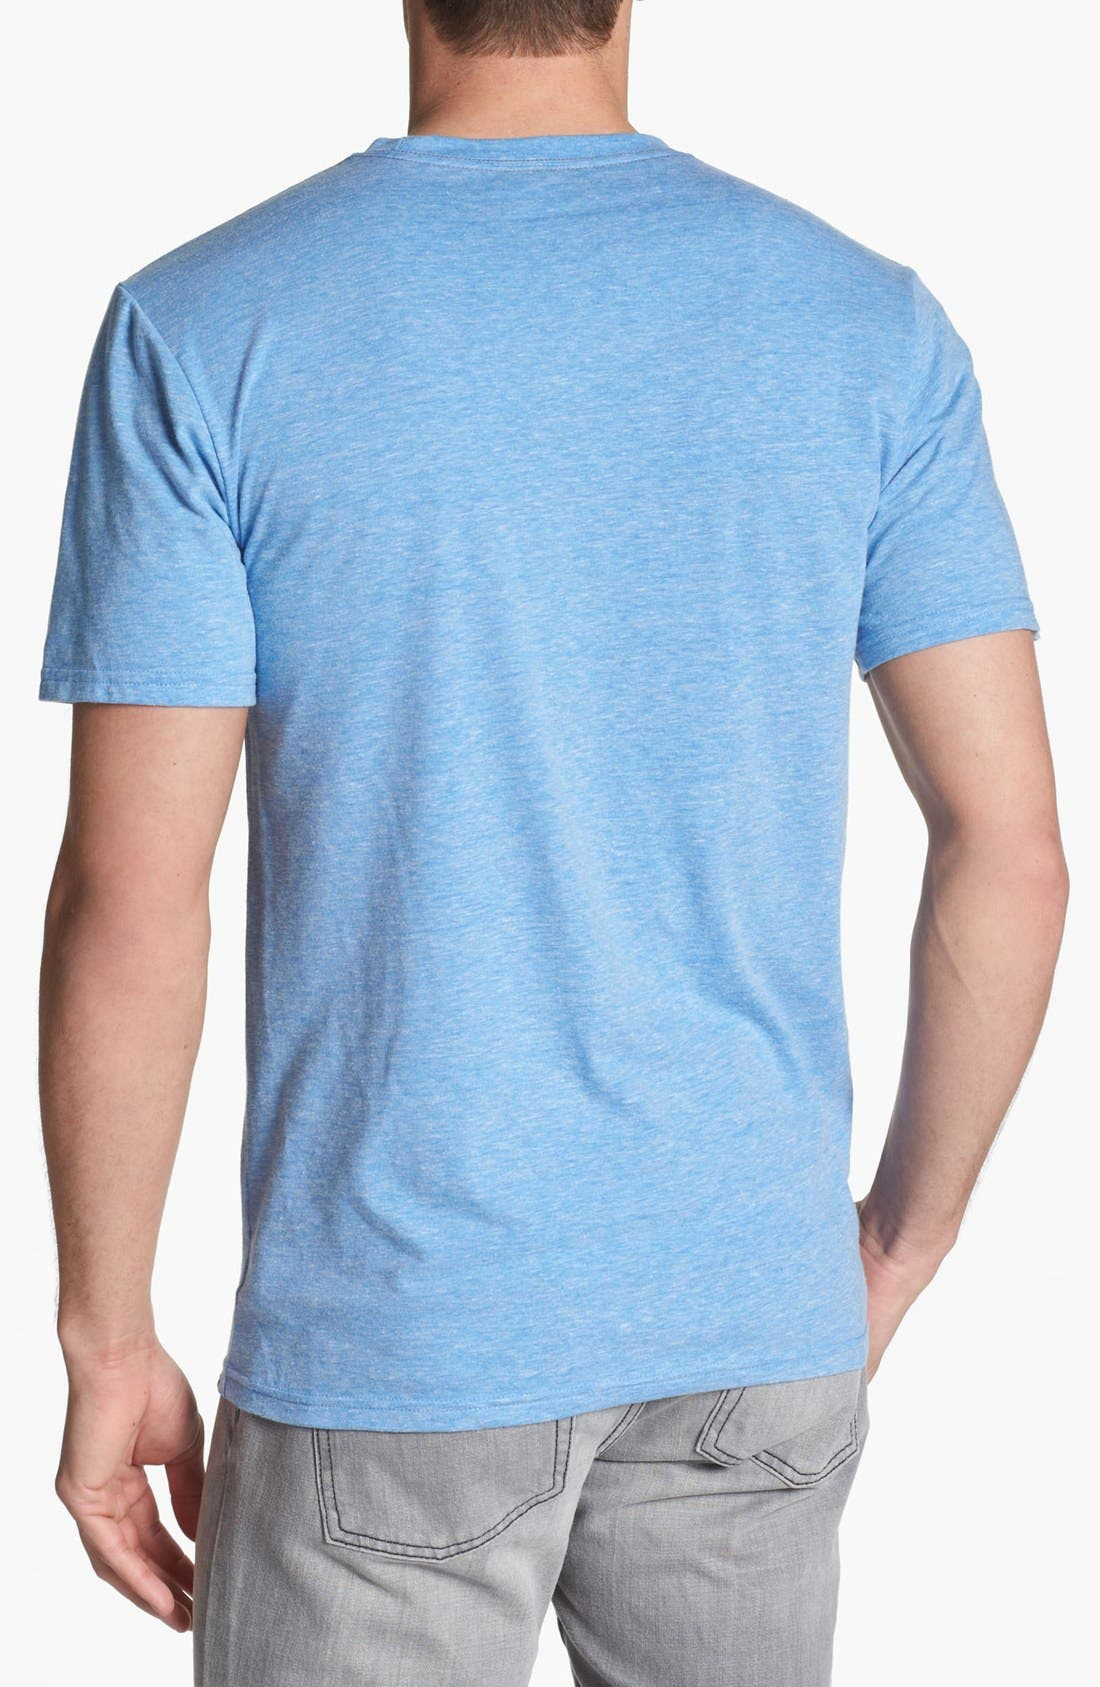 Alternate Image 2  - Quiksilver 'Tilt' Graphic T-Shirt